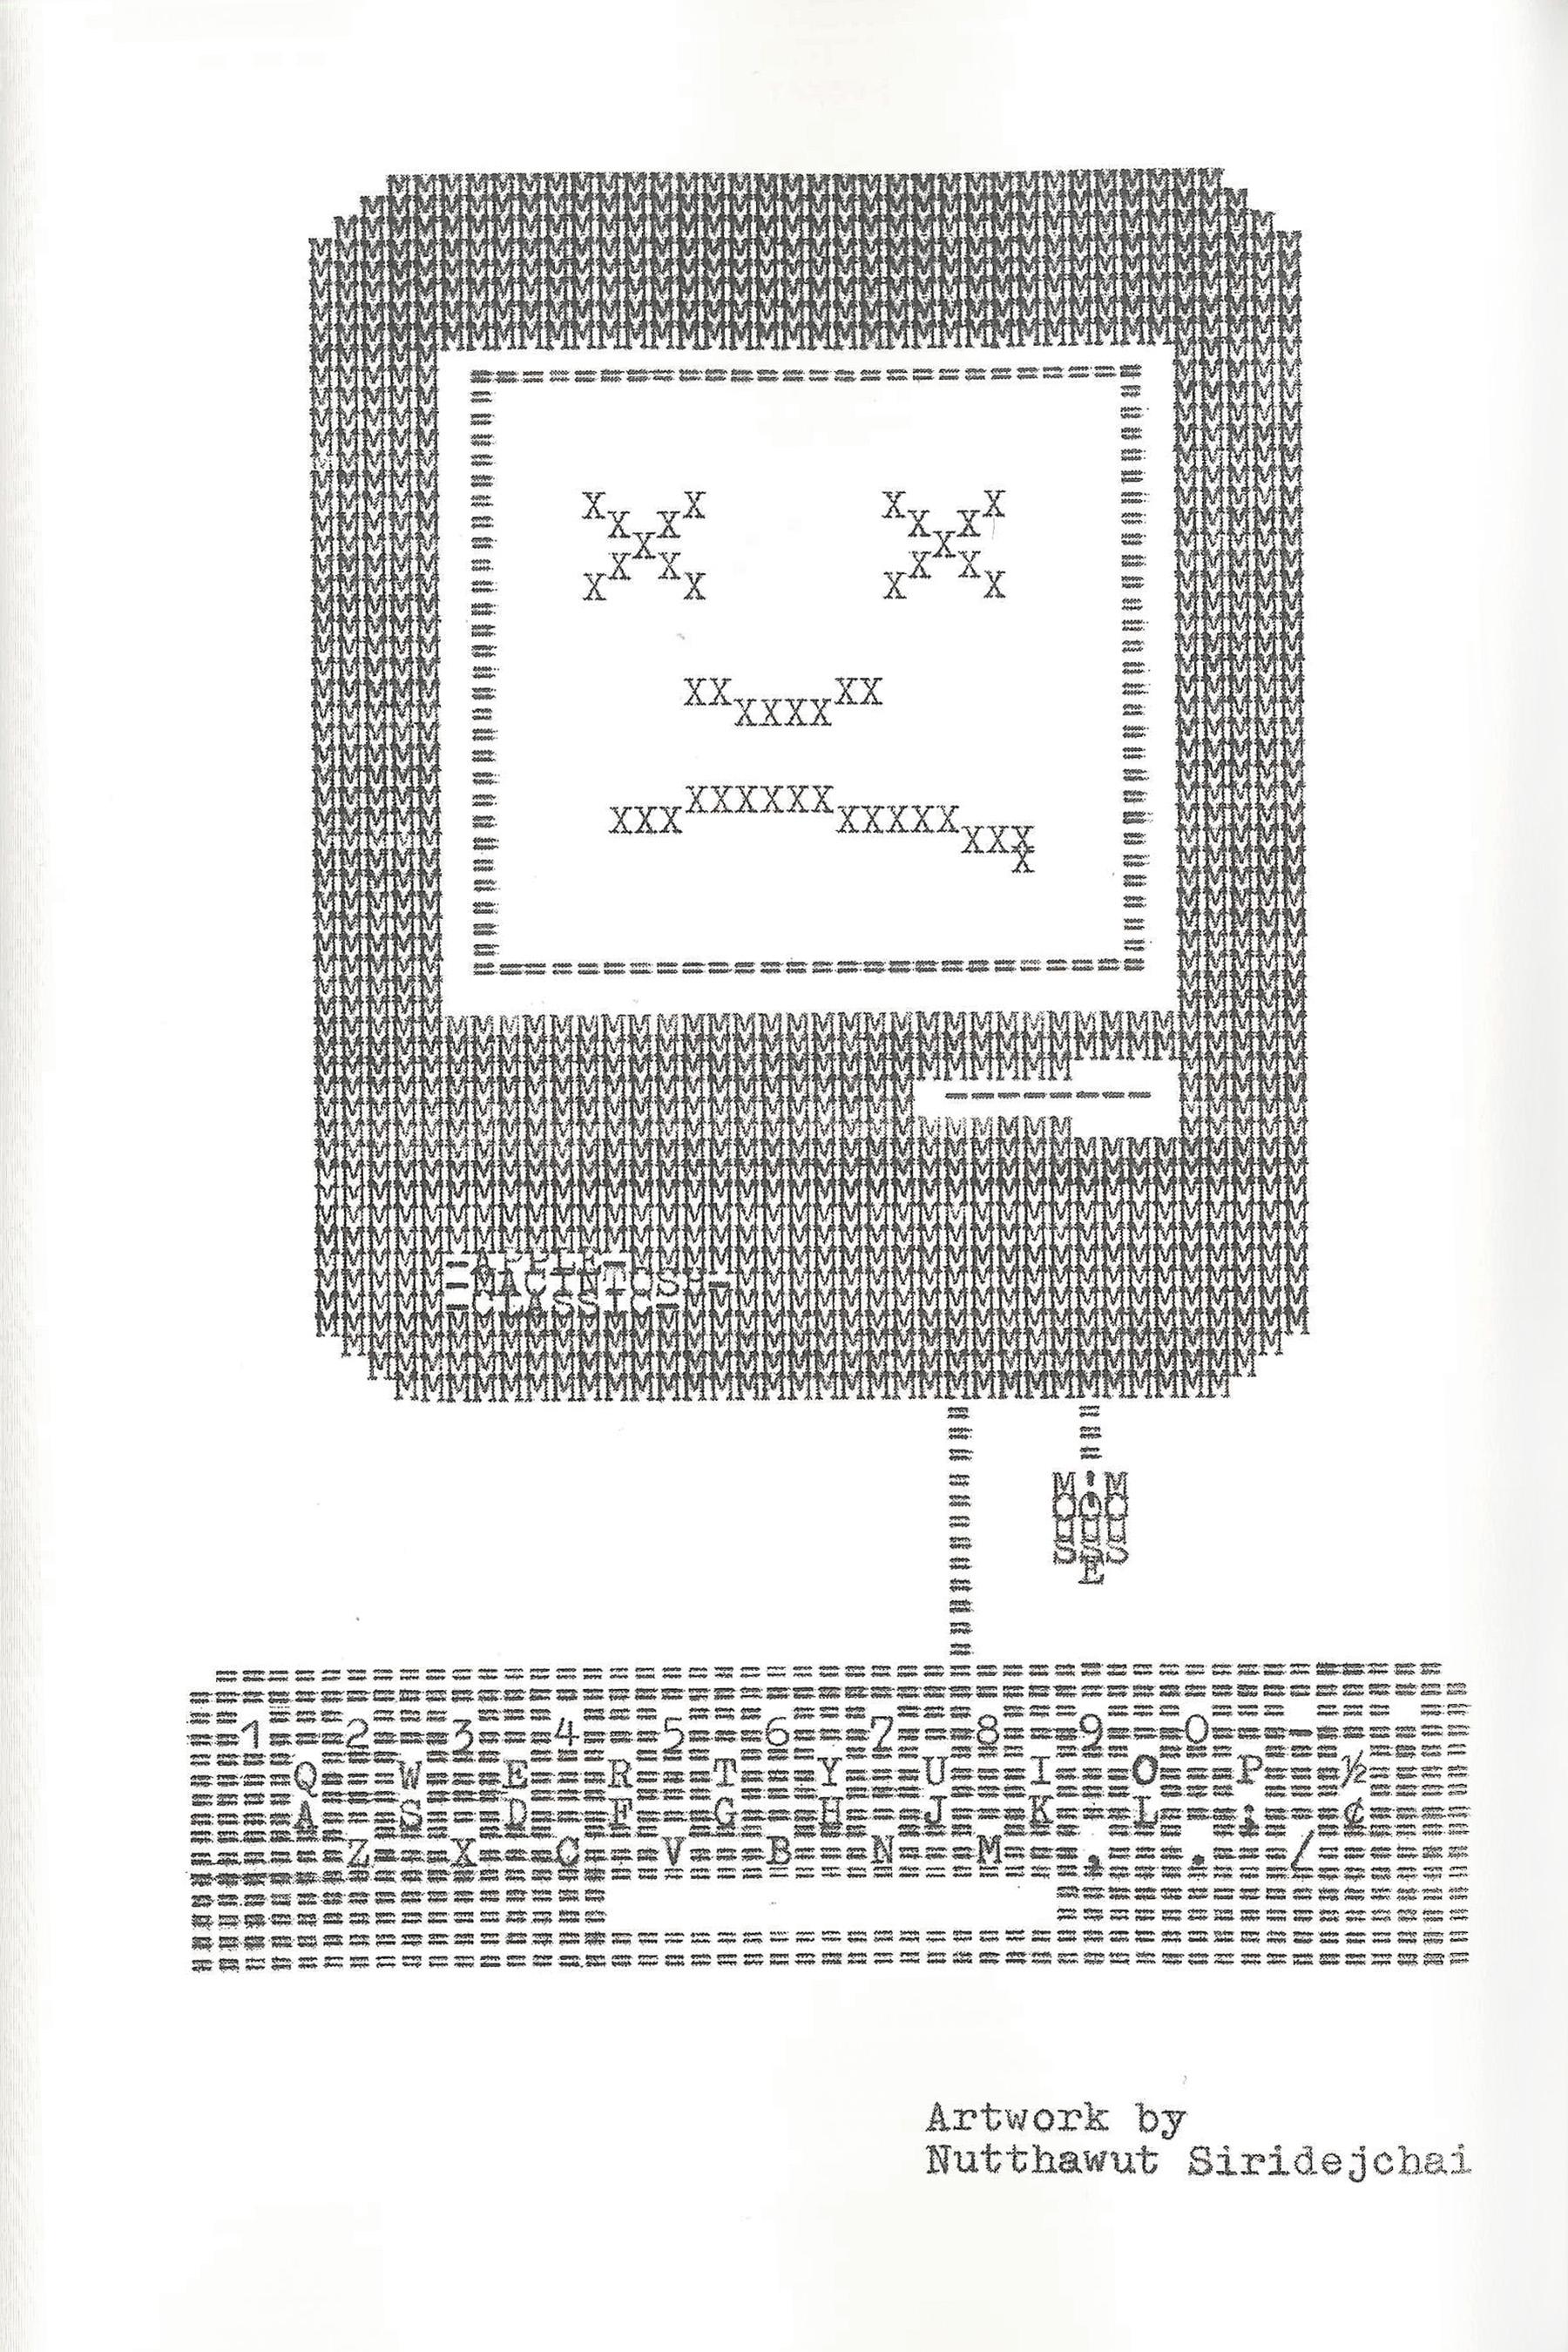 SAD MAC, 2019, Typewriter Drawing, 6 x 9 inches on page 66